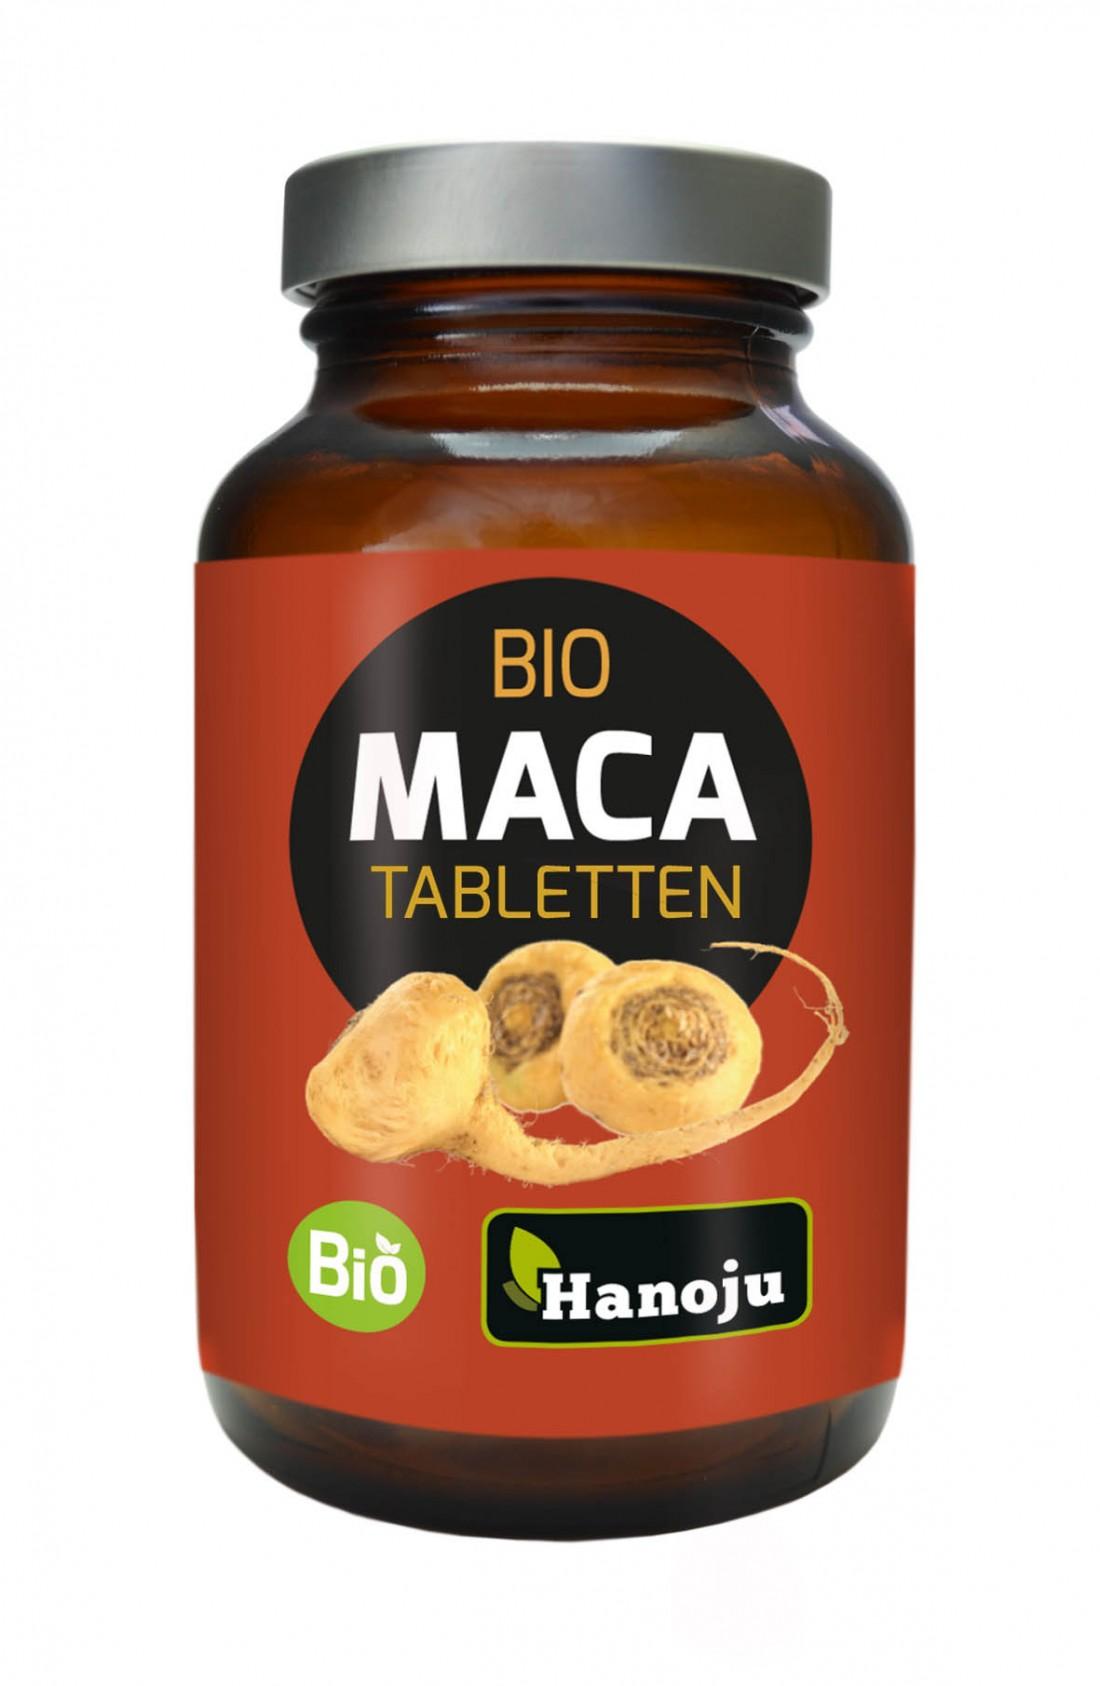 714090-Rotes-Bio-Maca-500mg-Tabletten-BG-kl-68x195_1